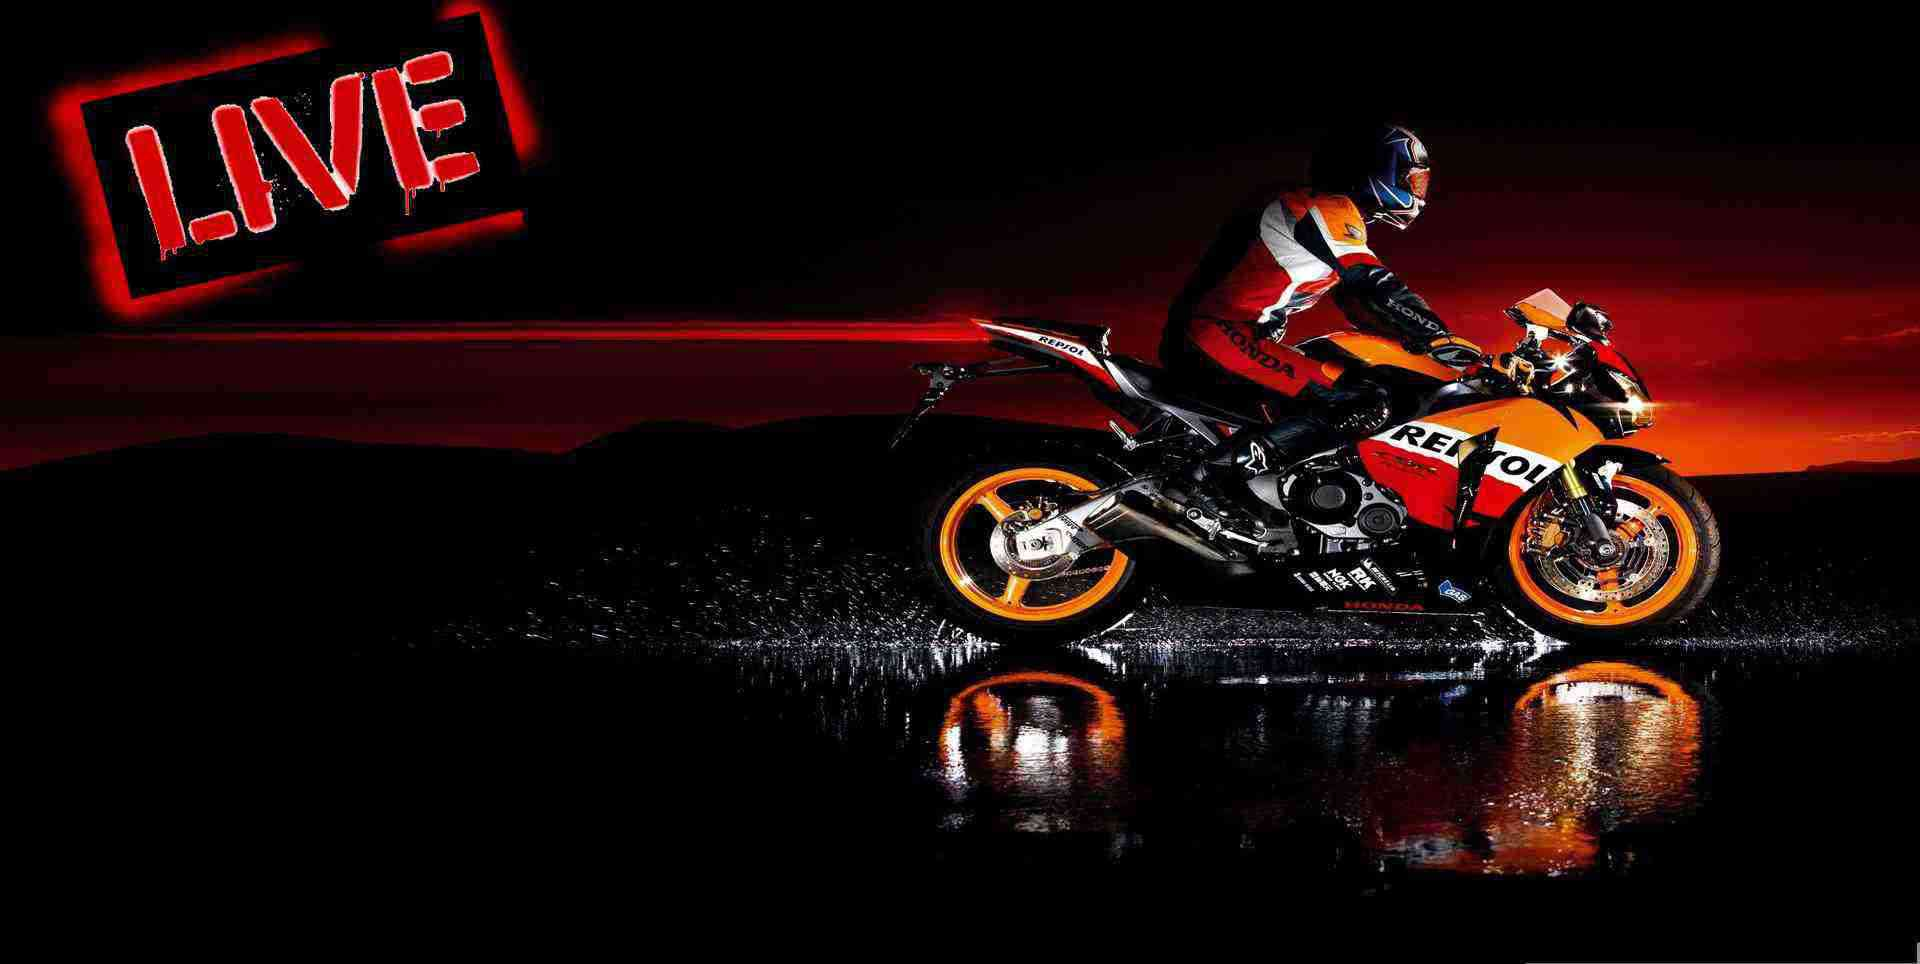 grand-prix-of-qatar-motogp-2015-live-telecast